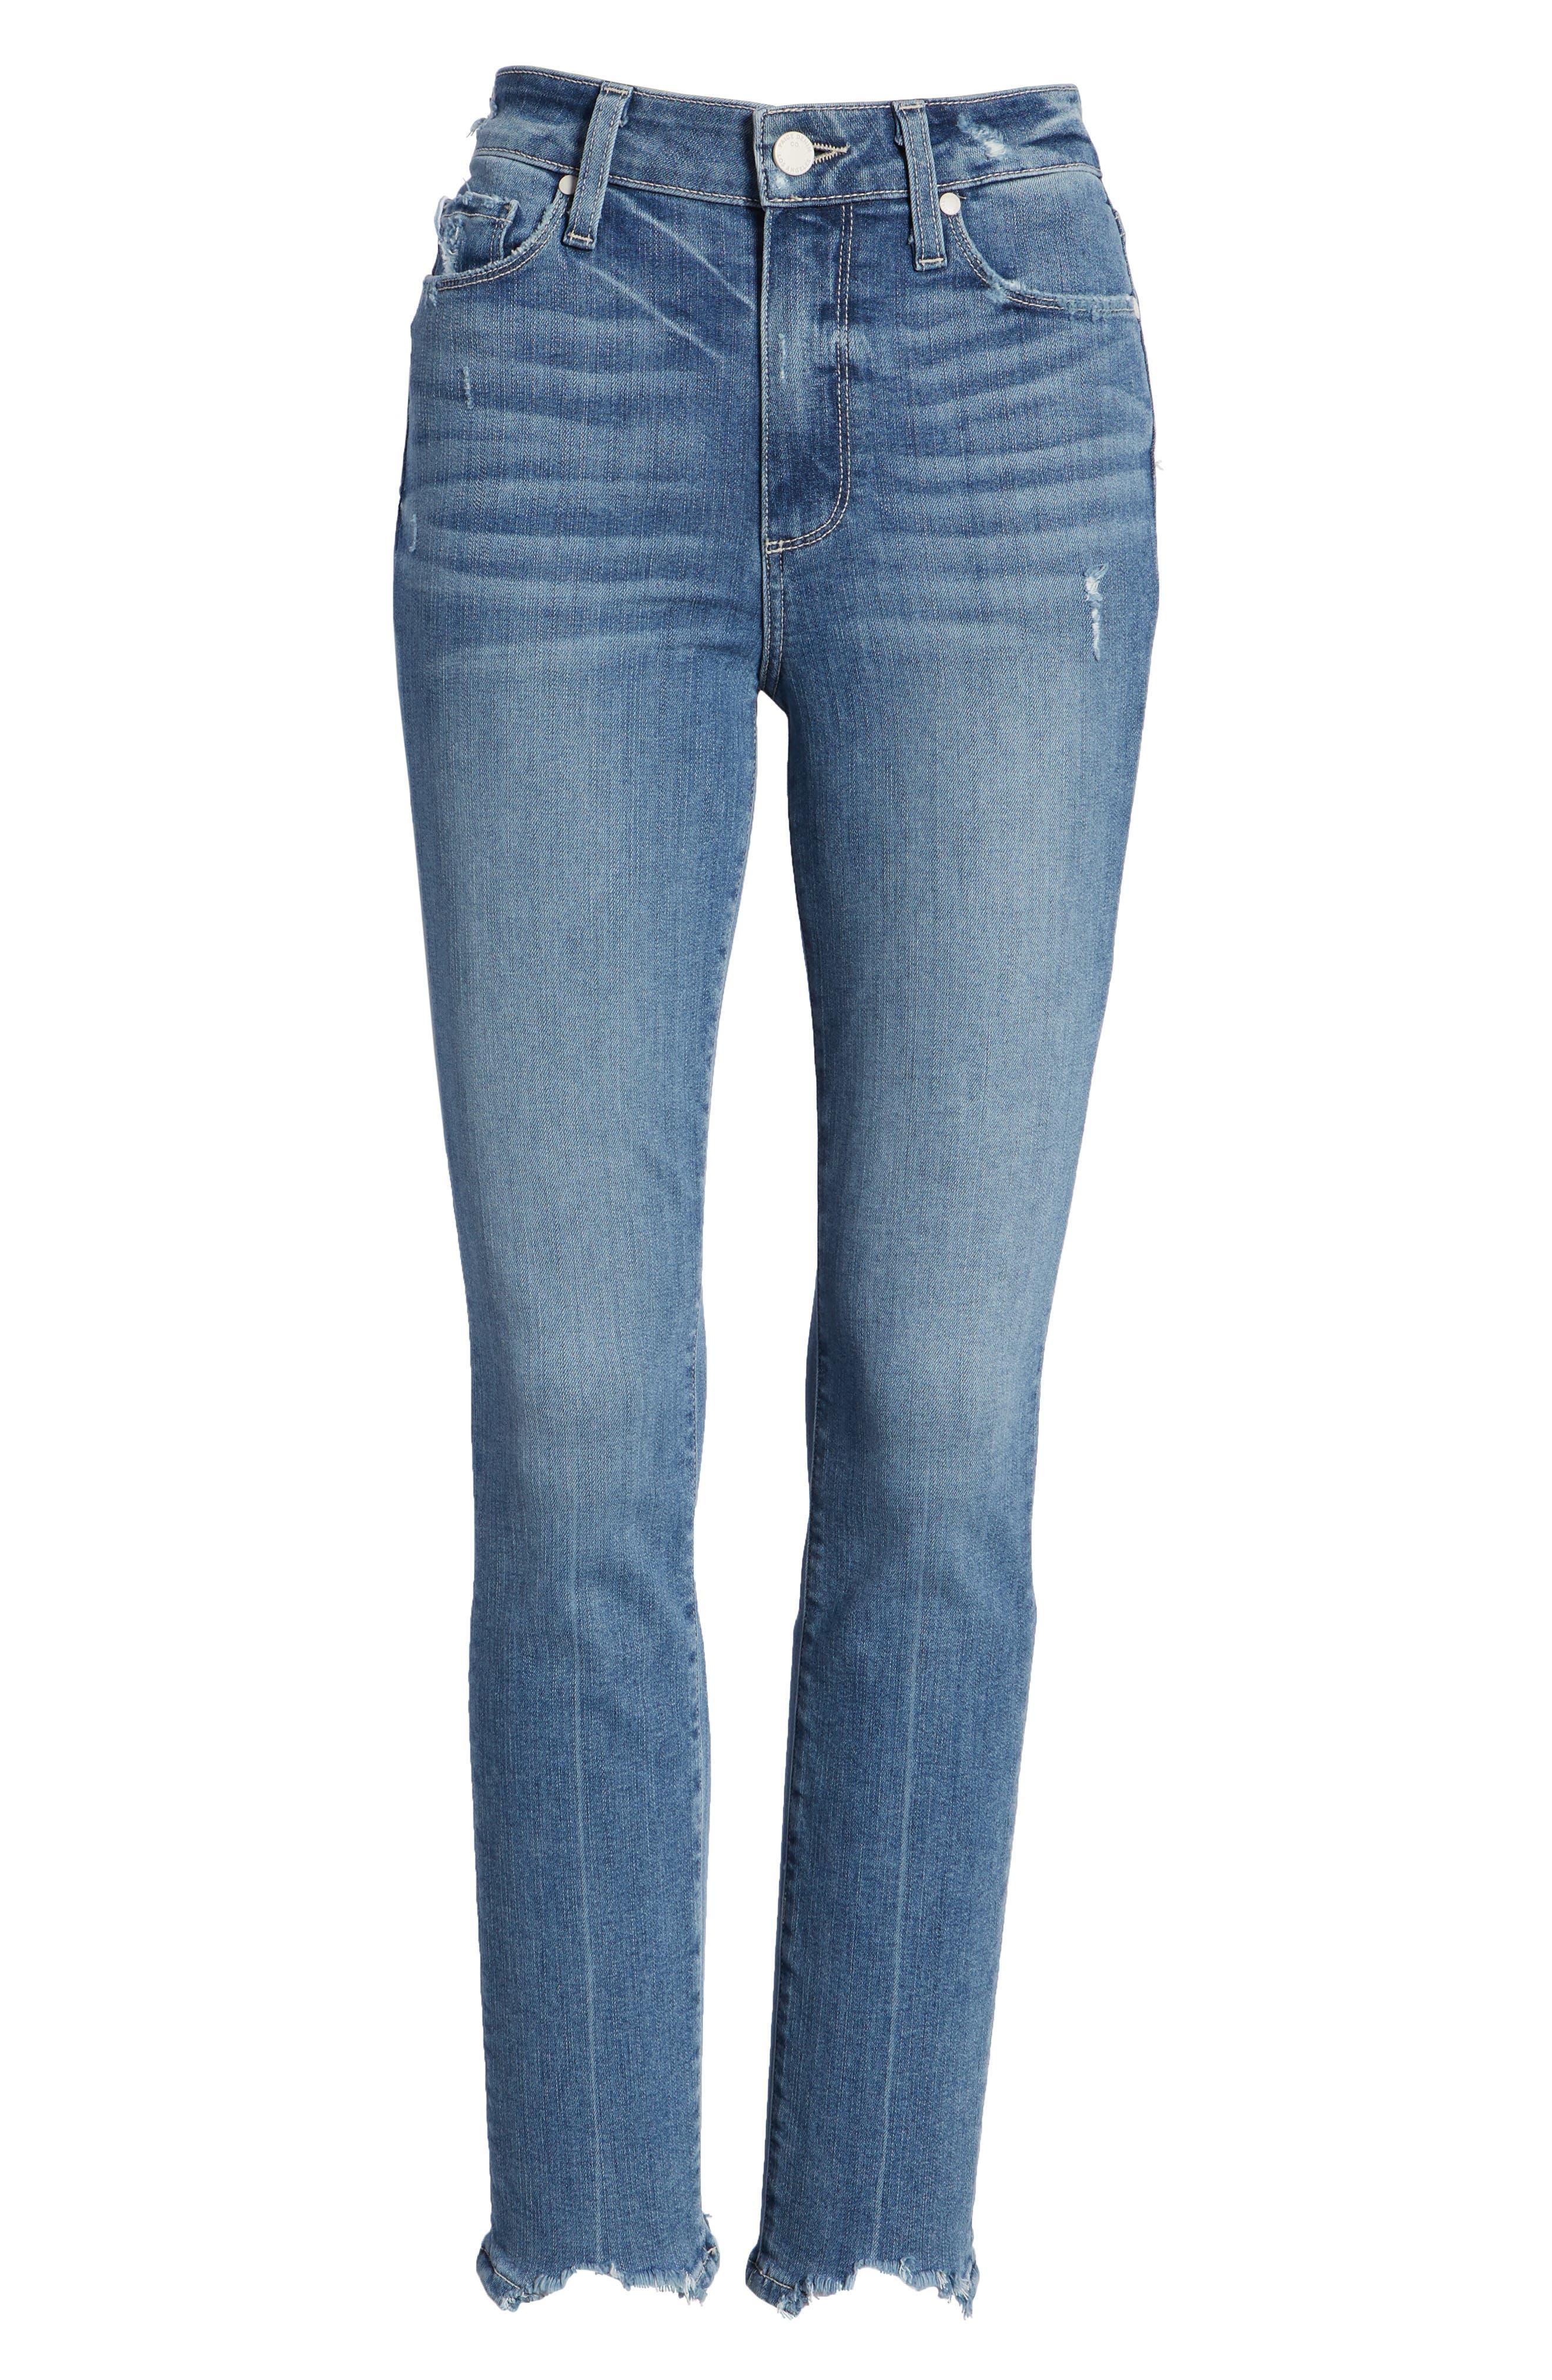 Transcend Vintage - Hoxton High Waist Ankle Skinny Jeans,                             Alternate thumbnail 7, color,                             400